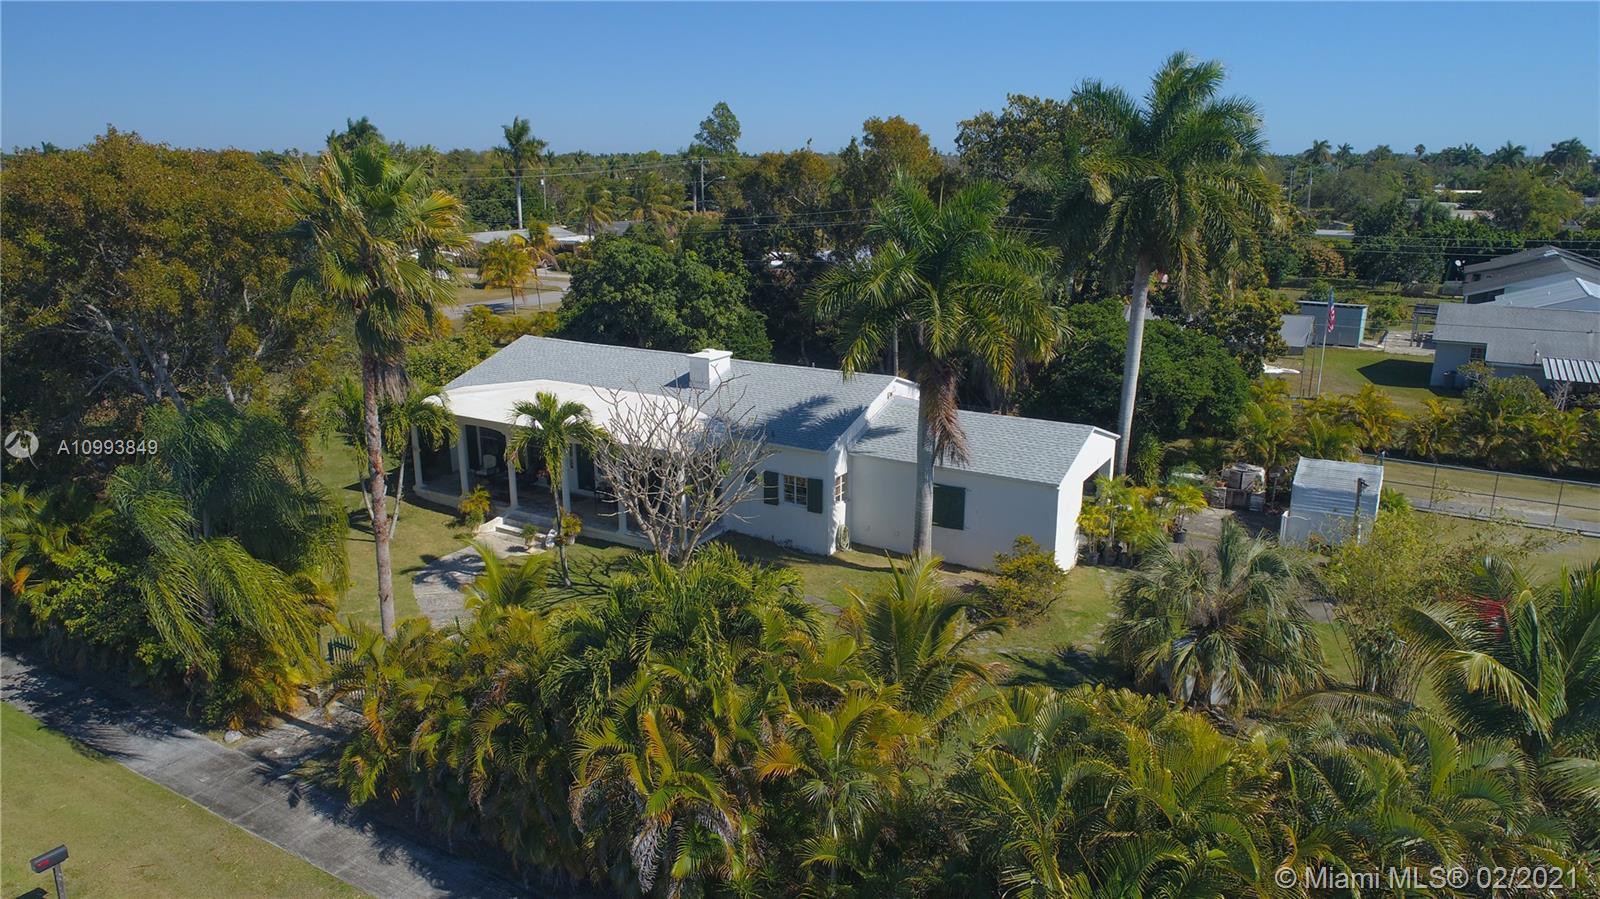 1601 NE 1st Ter Property Photo - Homestead, FL real estate listing